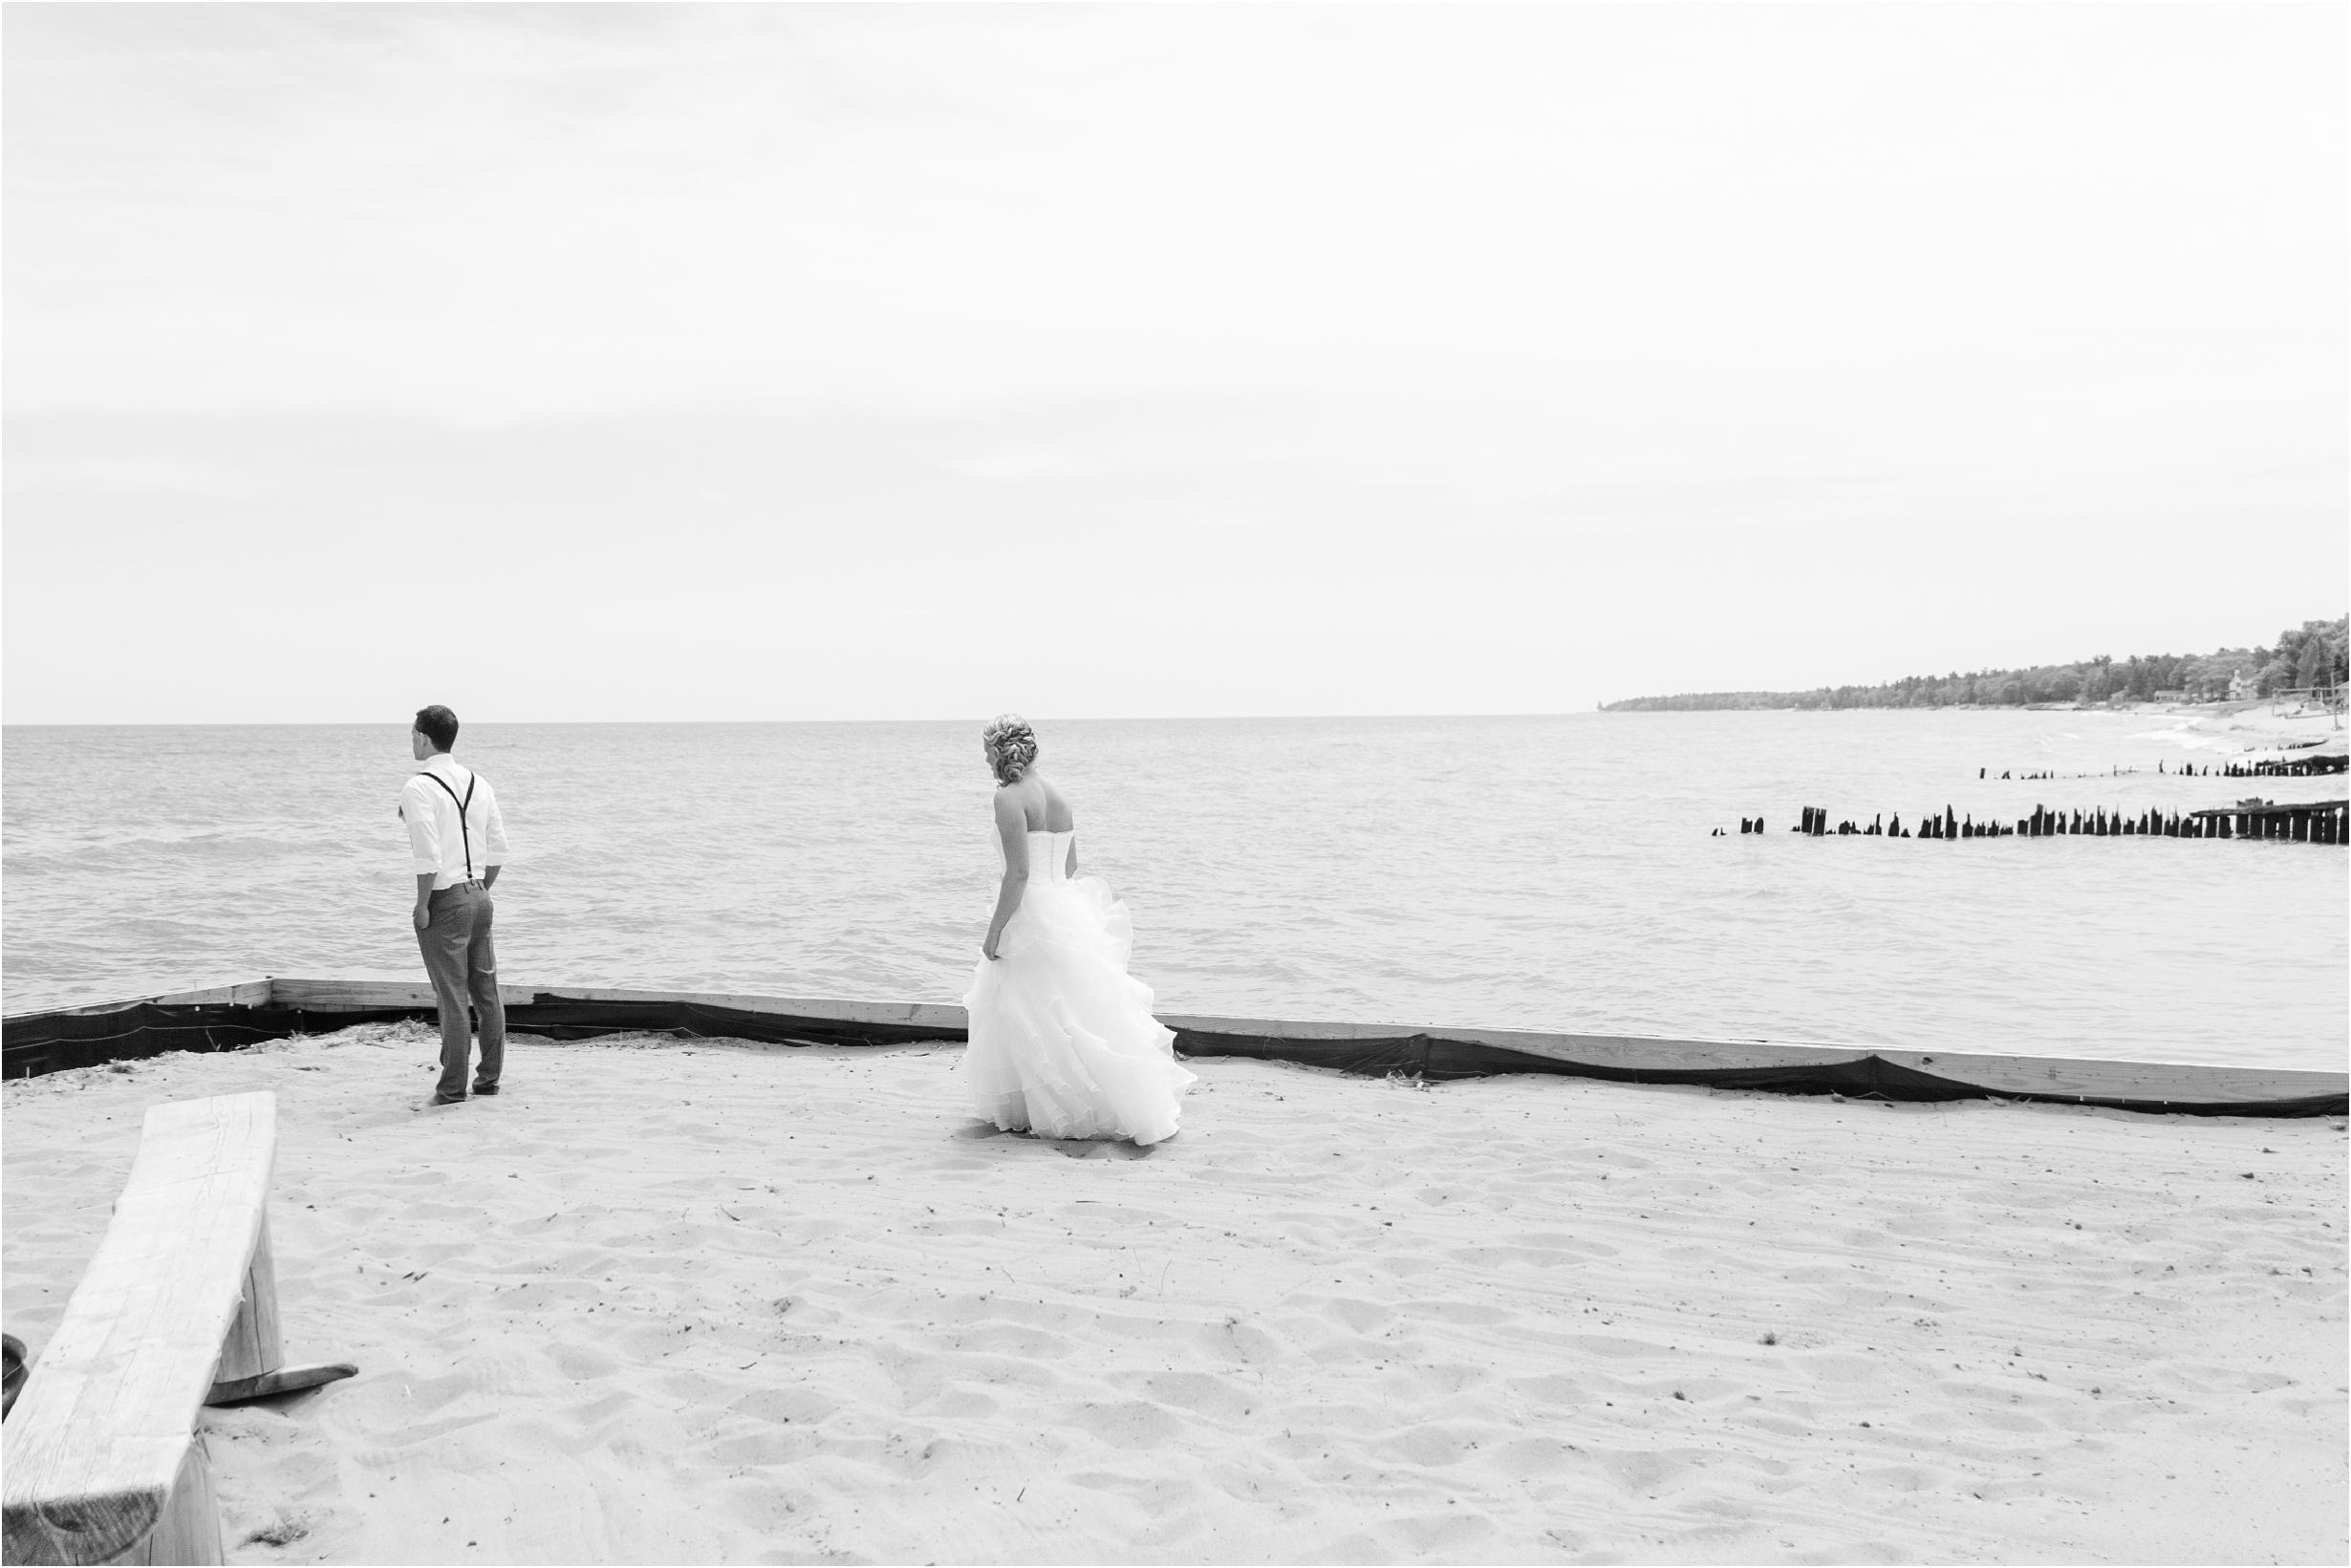 romantic-timeless-candid-wedding-photos-at-the-mai-tiki-resort-in-oscoda-mi-by-courtney-carolyn-photography_0003.jpg